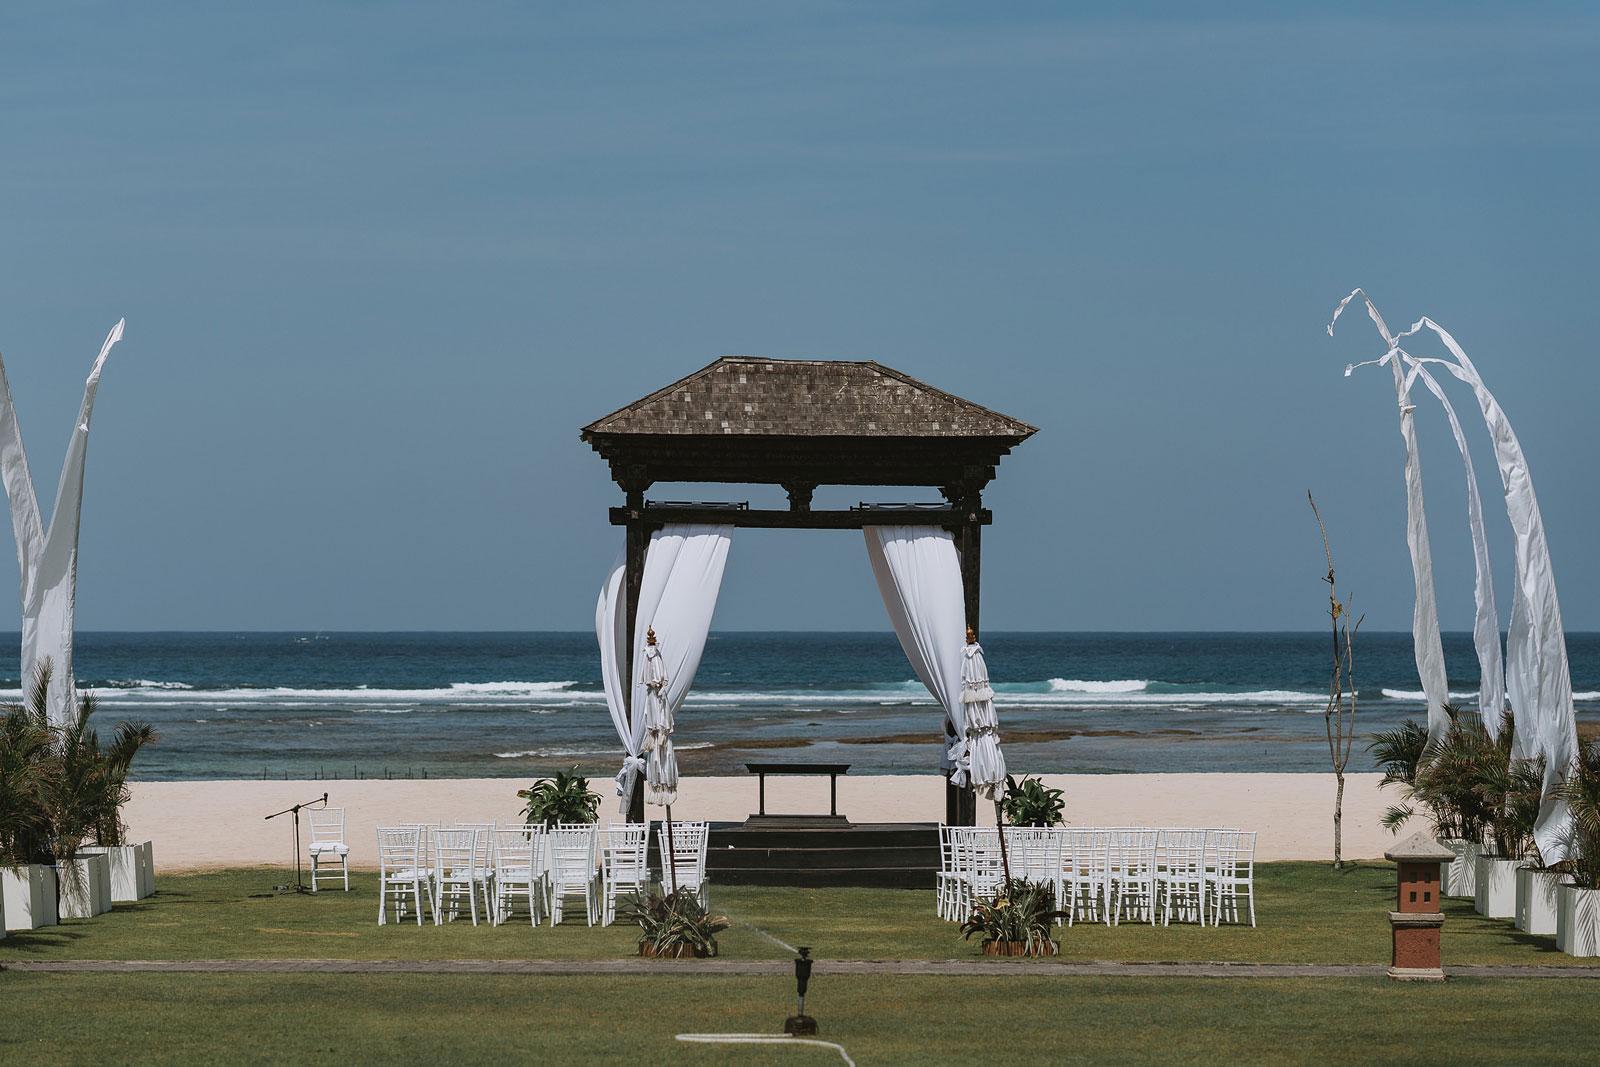 newfound-j-j-bali-nusa-dua-wedding-wedding-photographer-020-a